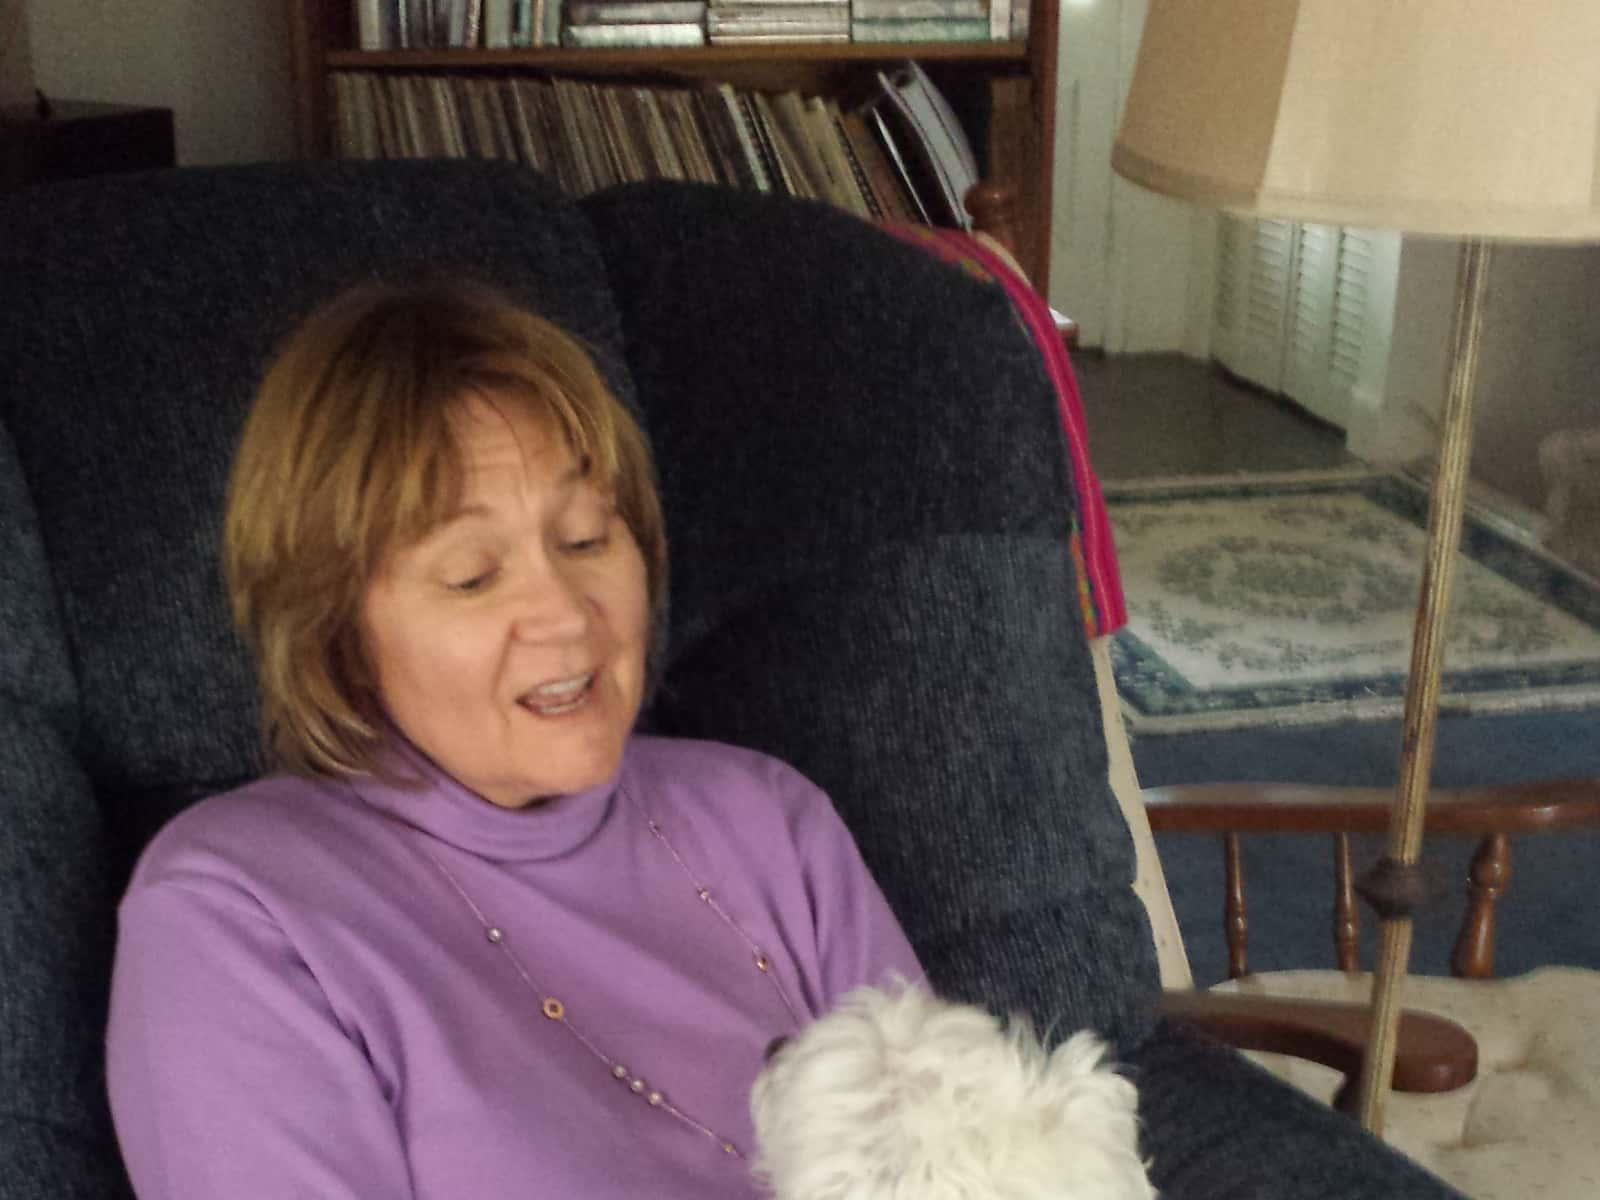 Hilda from Greenbelt, Maryland, United States